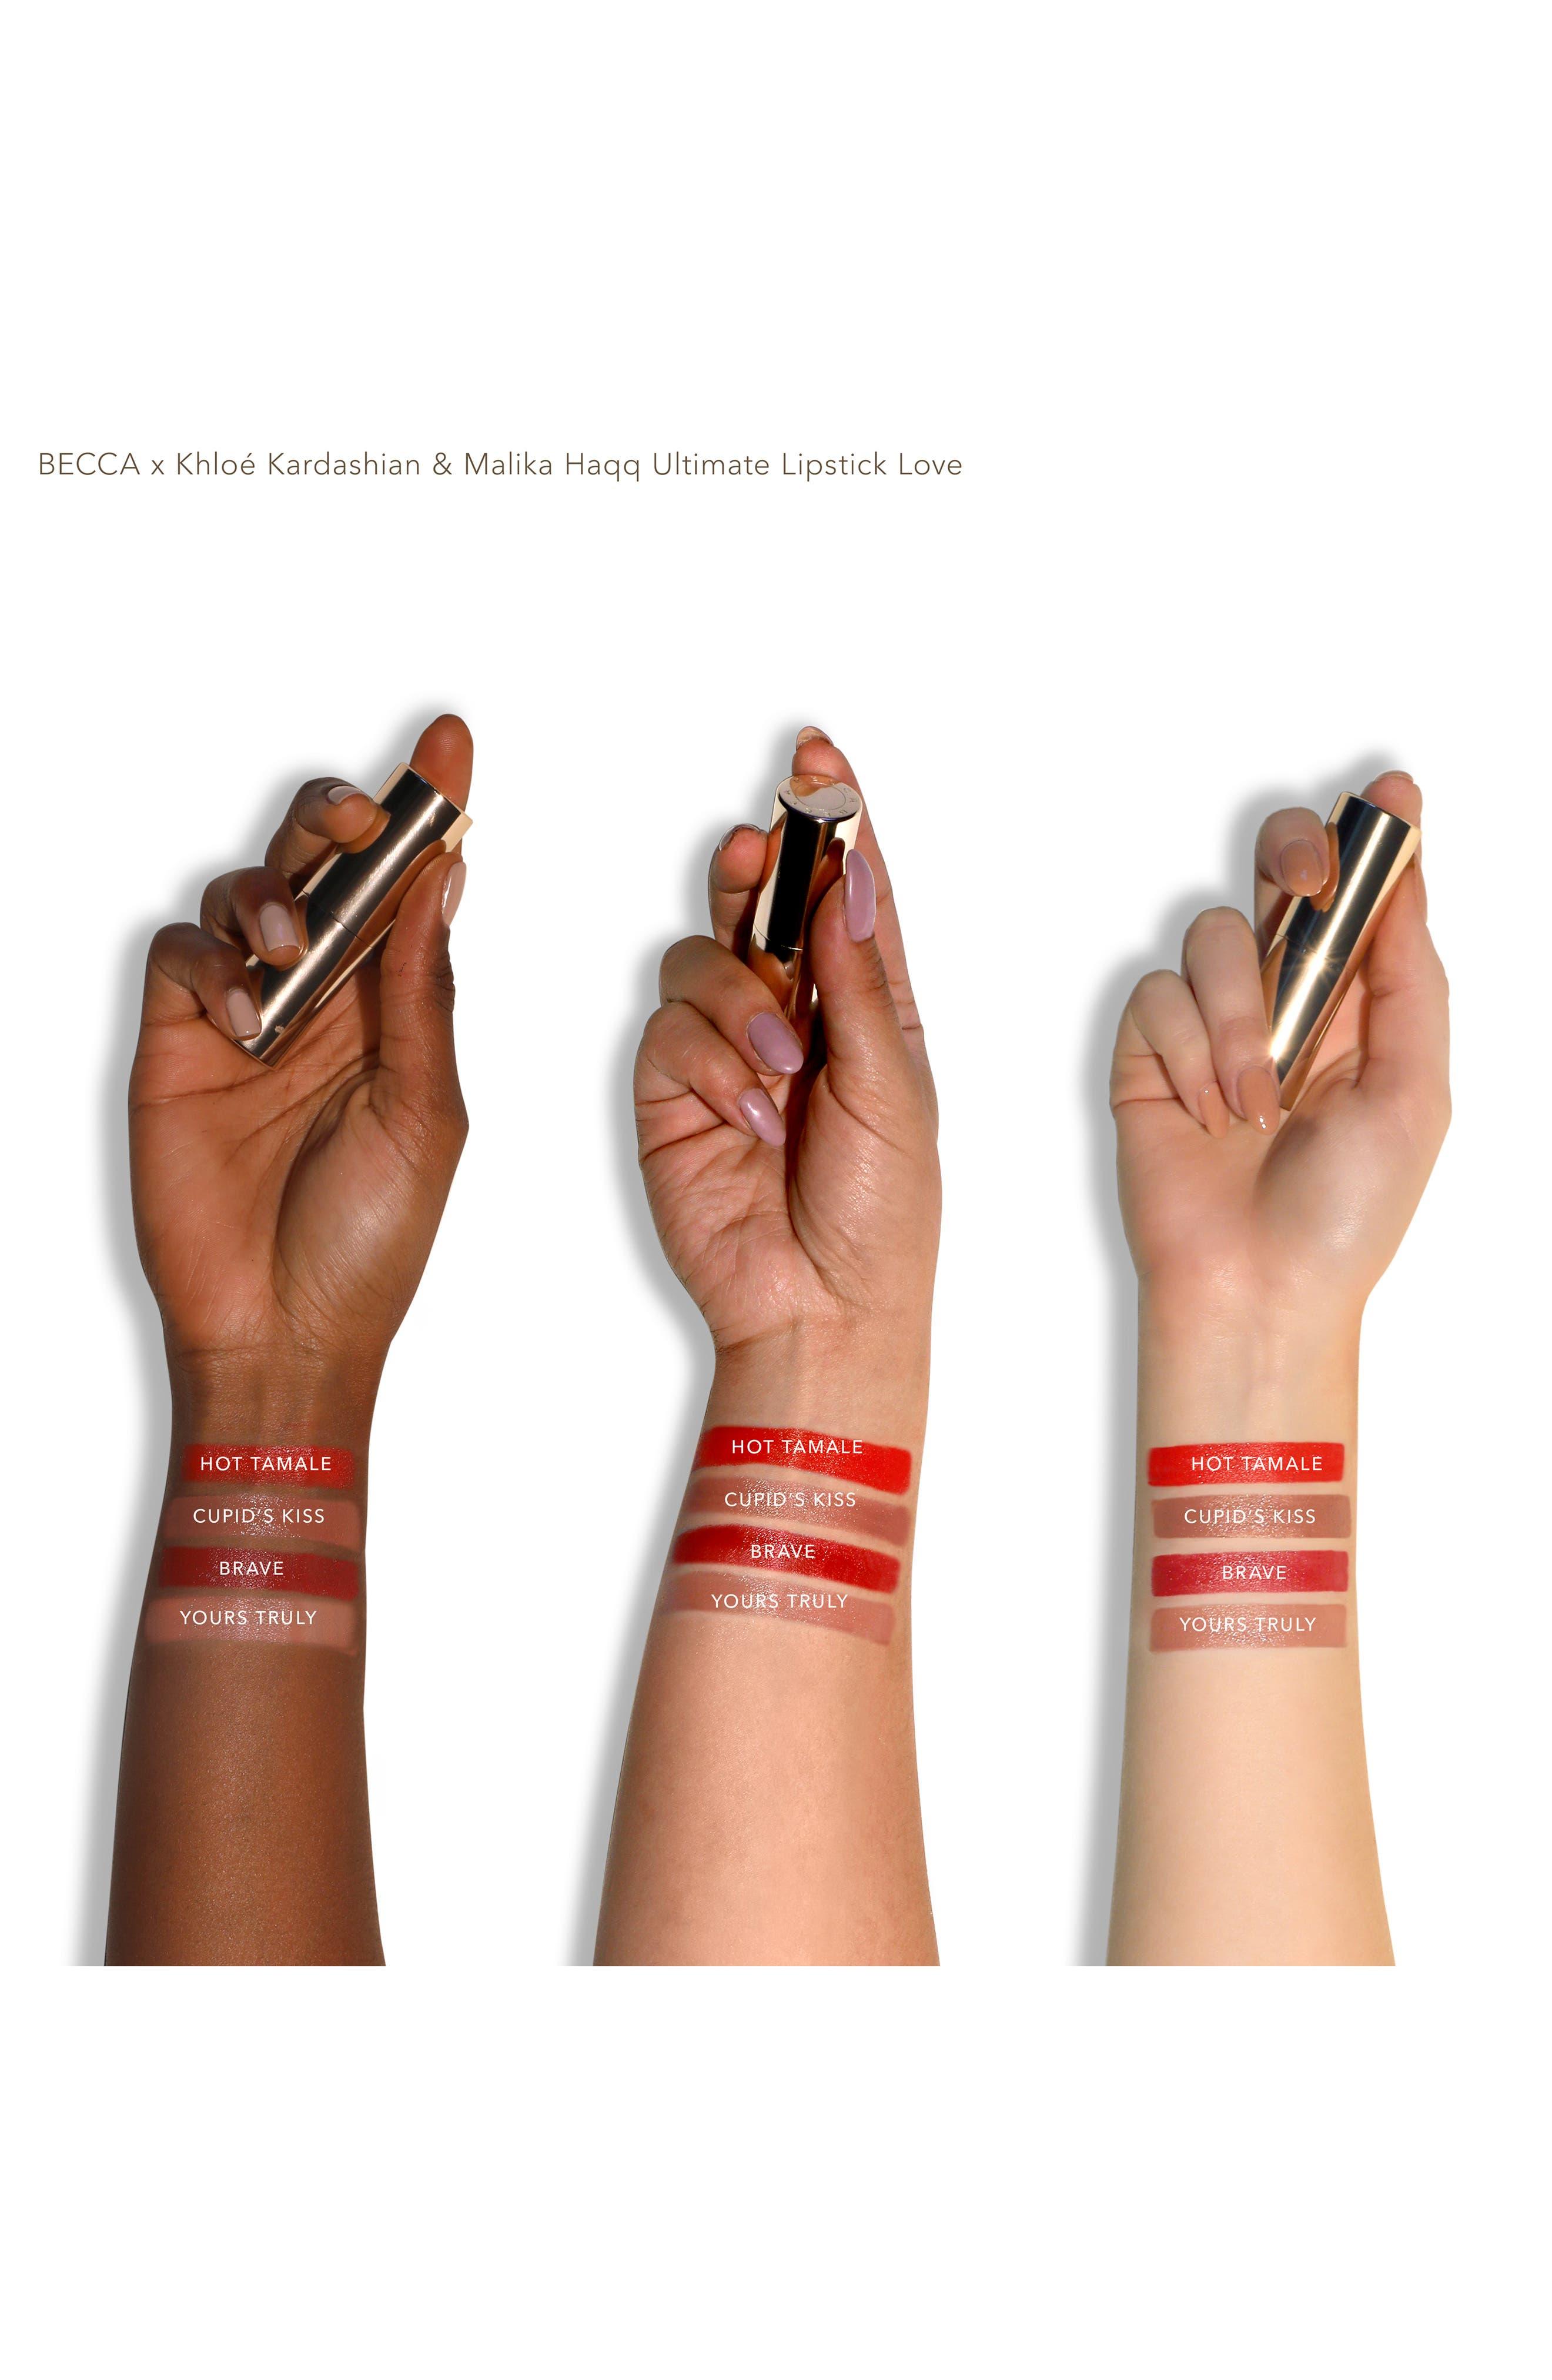 BECCA COSMETICS,                             BECCA x Khloé Kardashian & Malika Haqq BFF Ultimate Lipstick Love,                             Alternate thumbnail 2, color,                             CUPID KISS